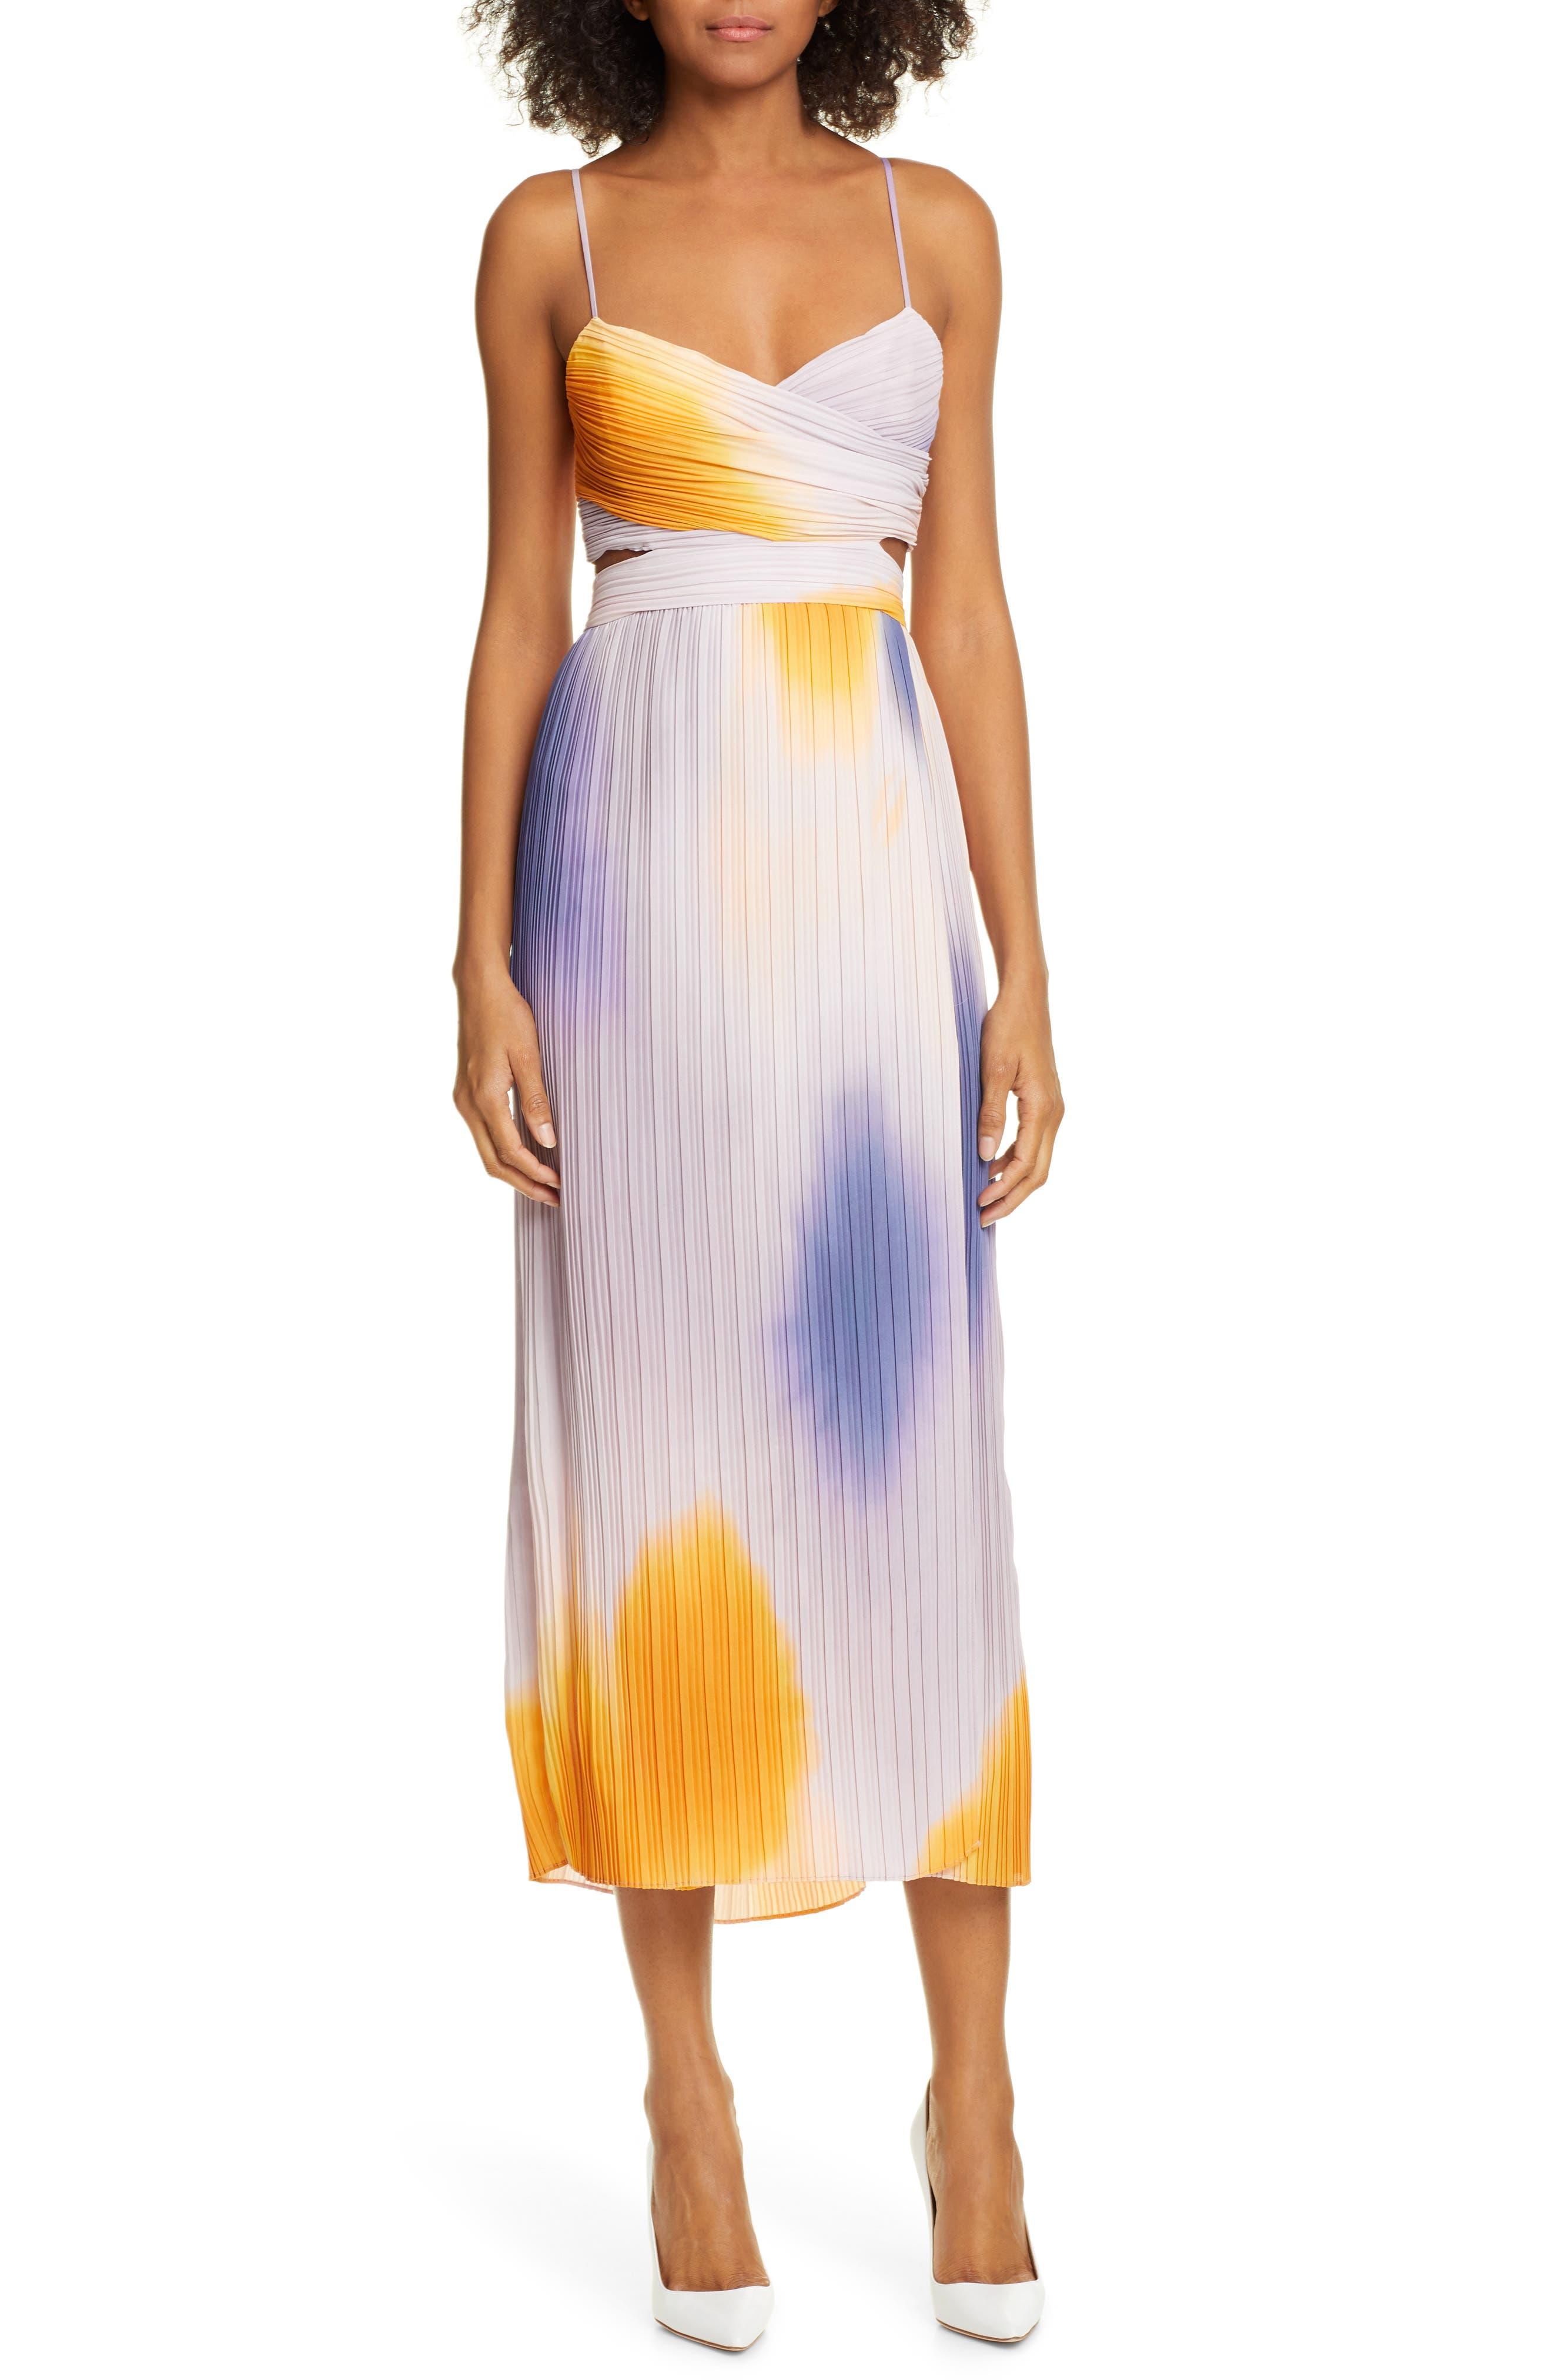 A.l.c. Sienna Ombre Midi Dress, White